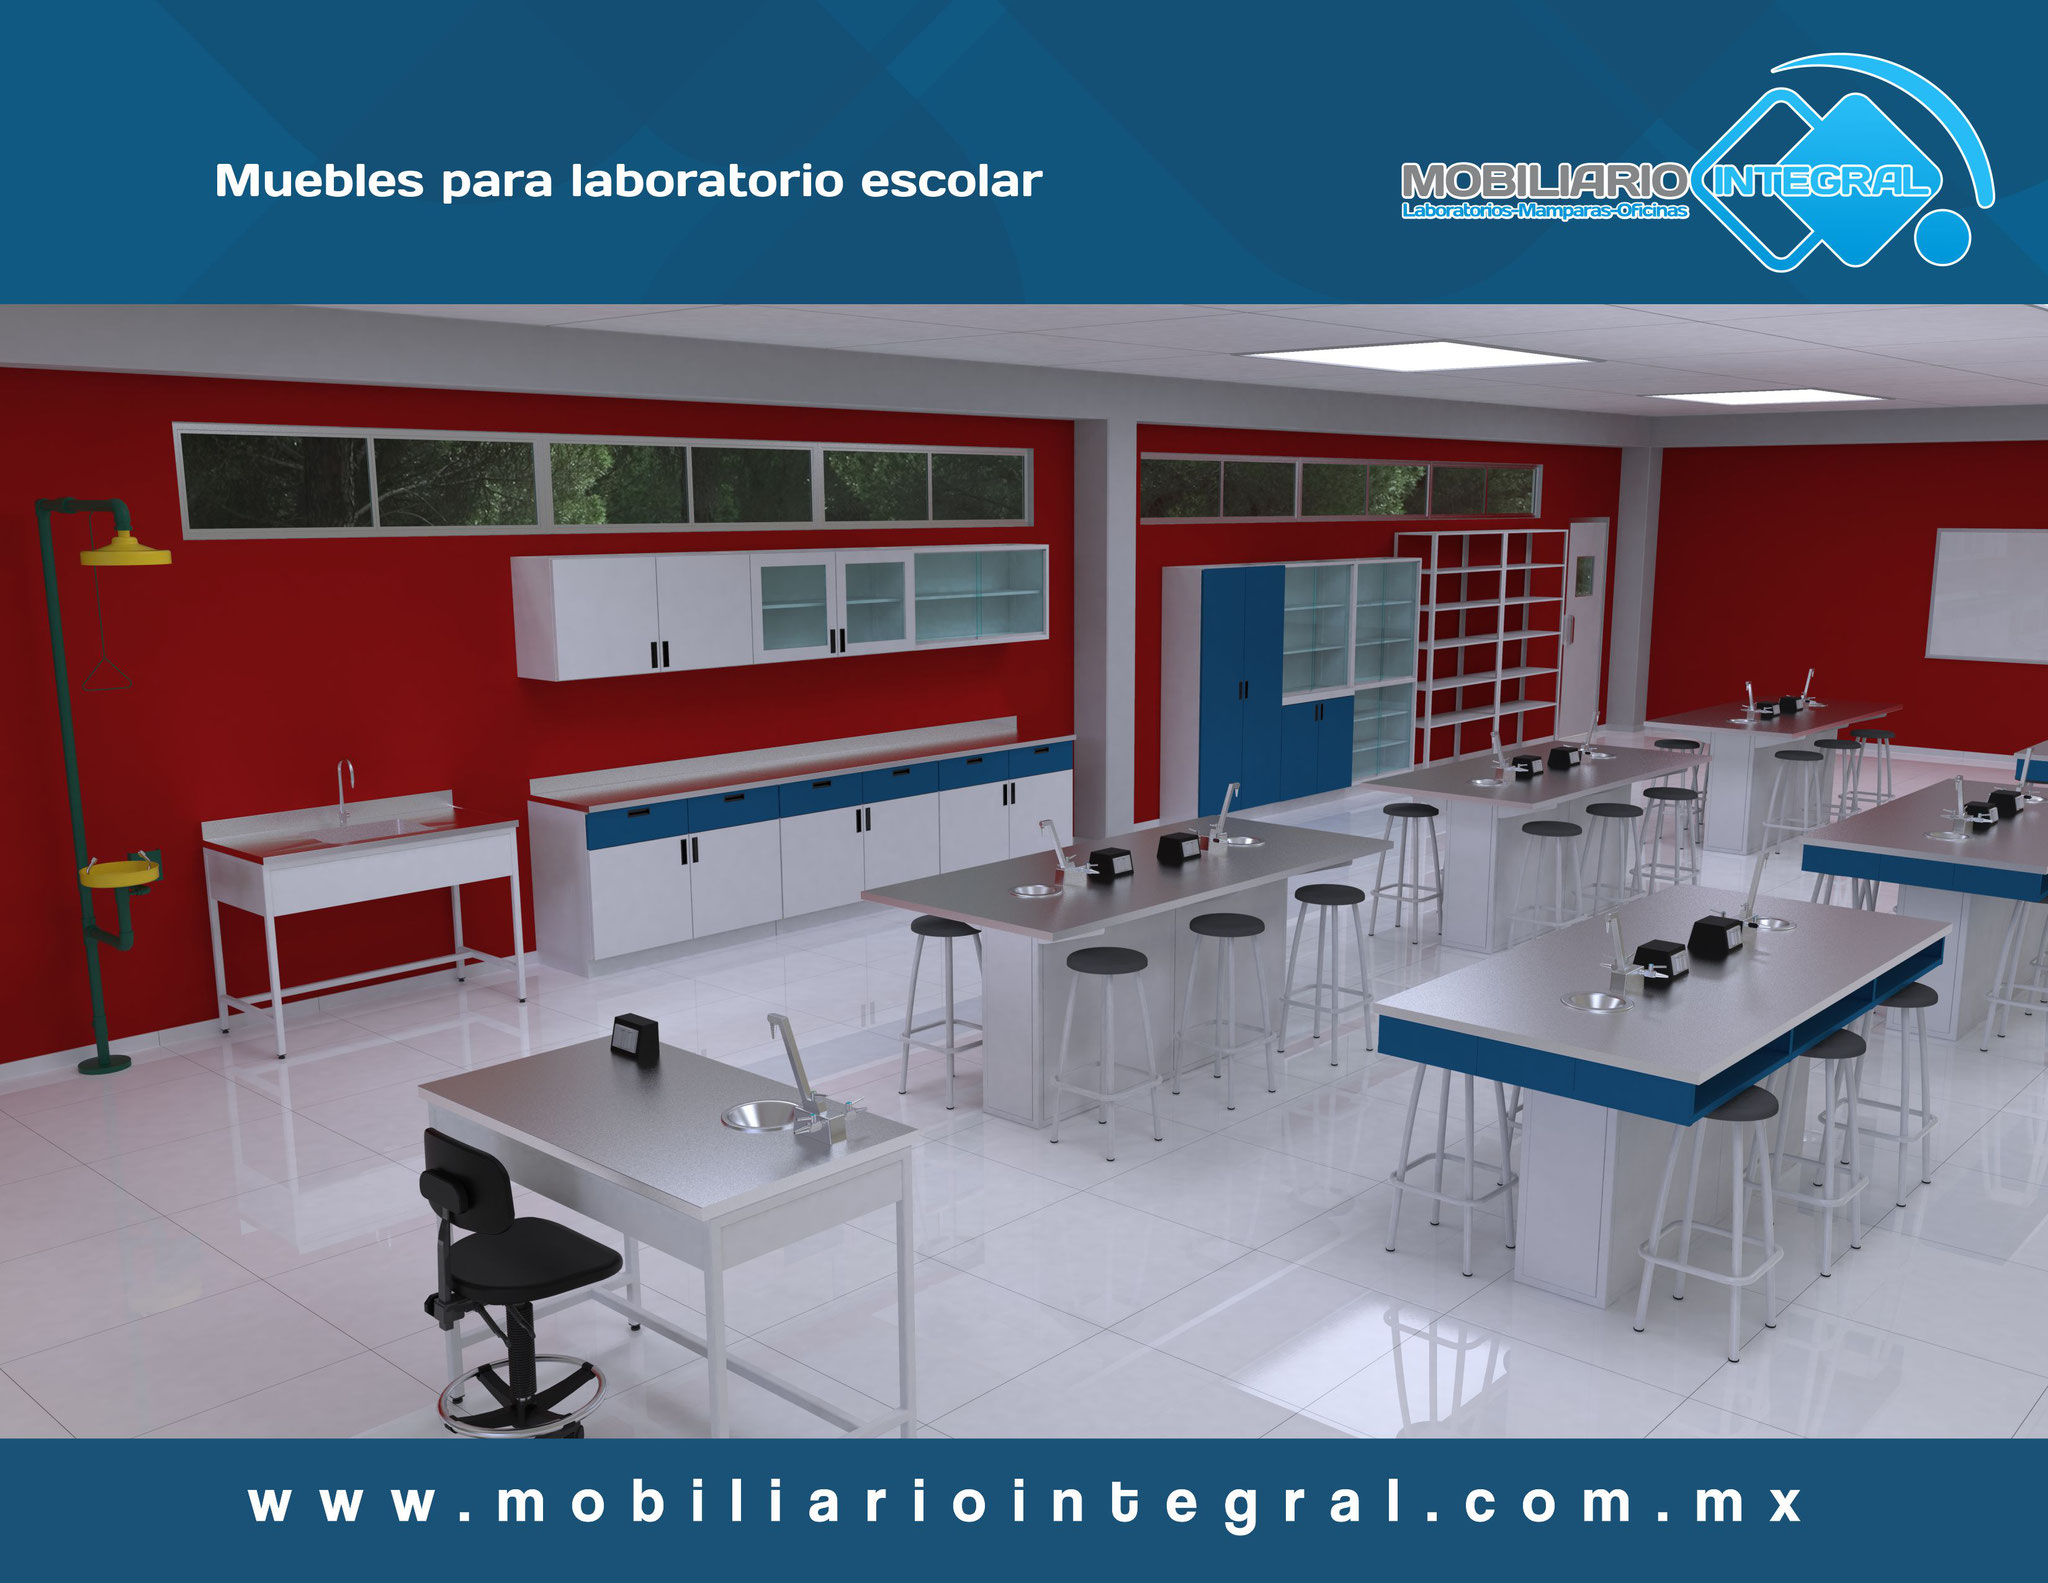 Muebles para laboratorio escolar Querétaro